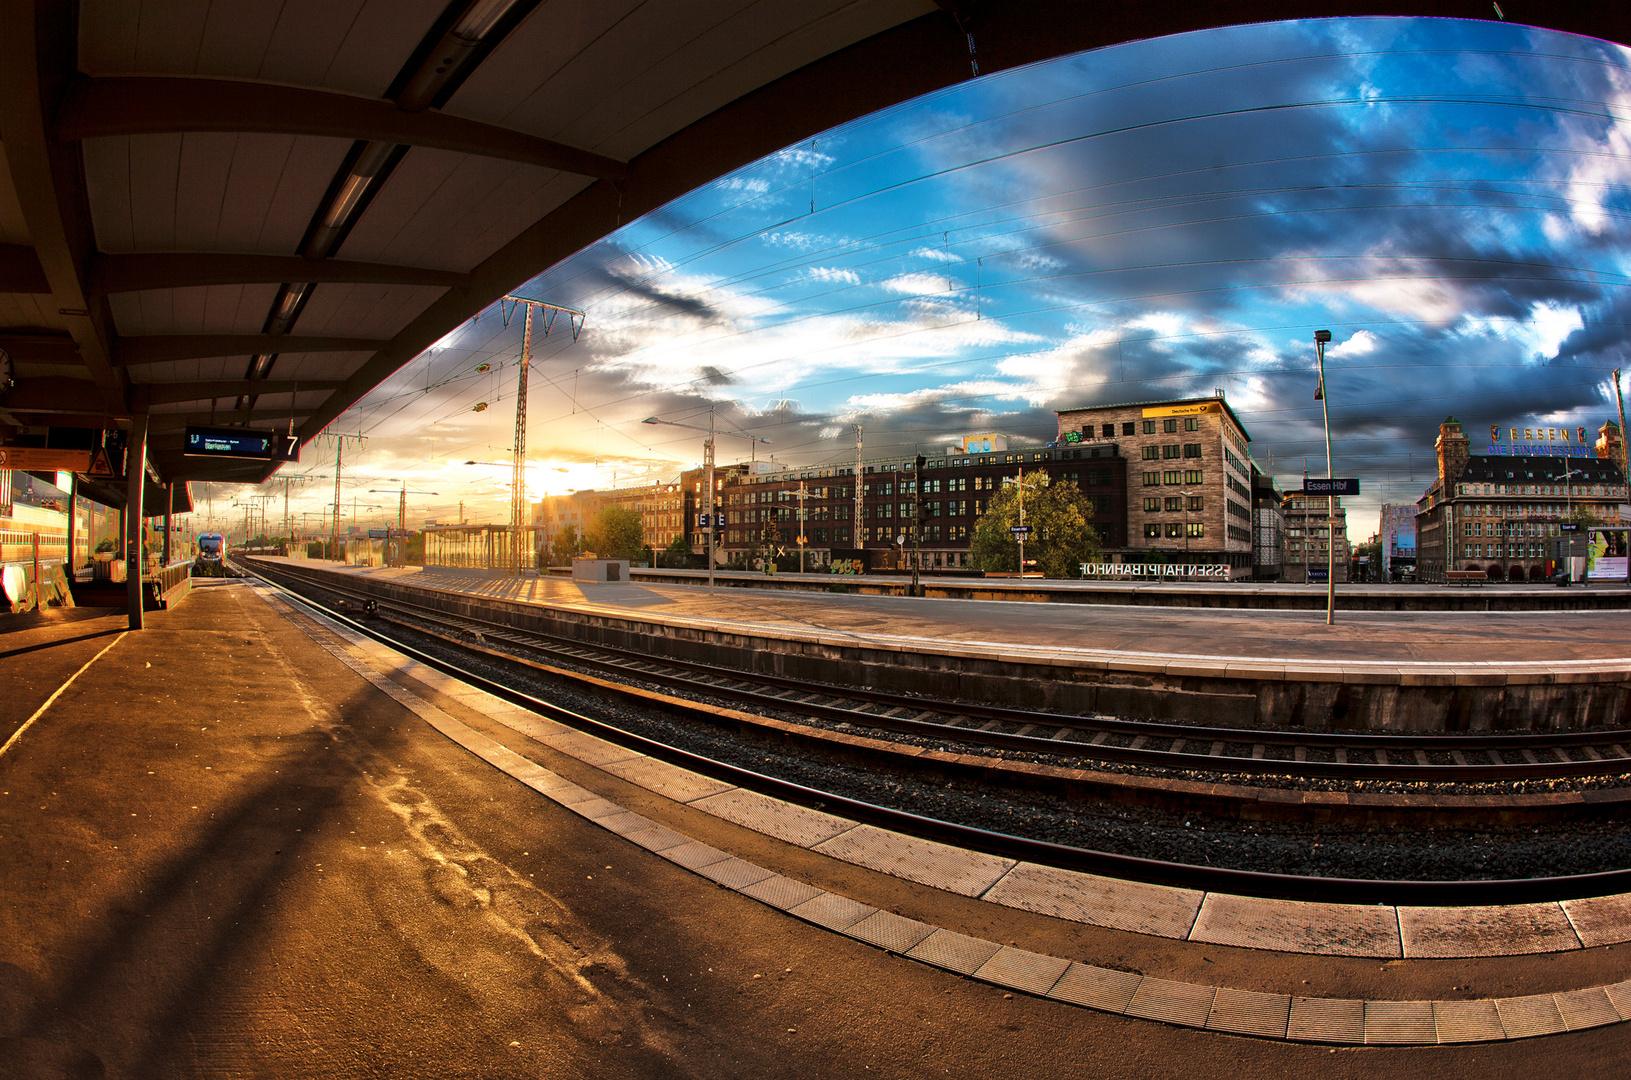 Essen Hauptbahnhof HDR